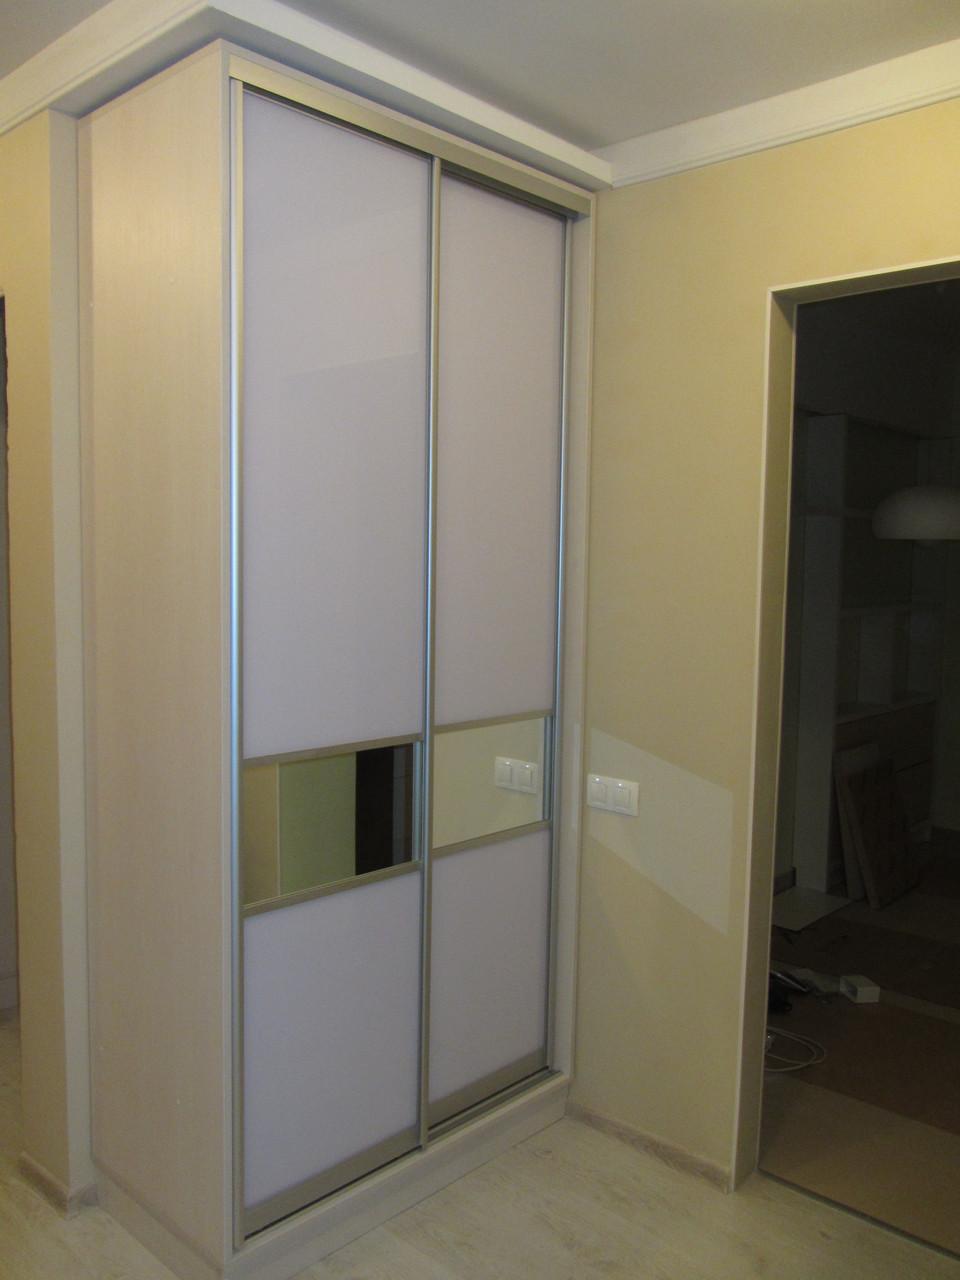 Шкаф купе на заказ корпус белый. Фасад фотопечать.  Z-214